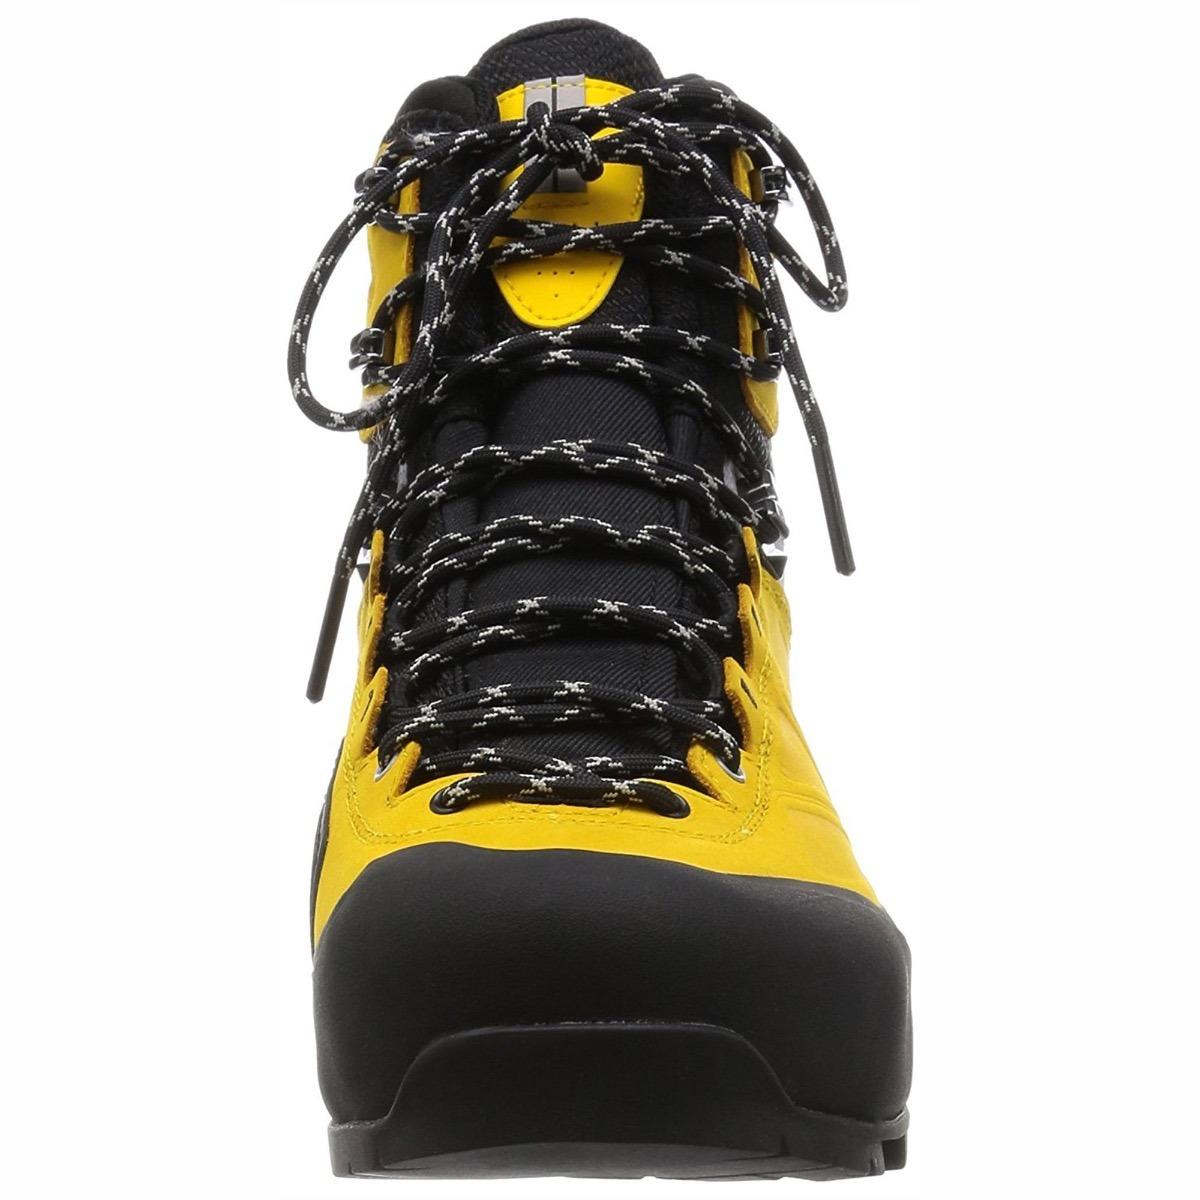 Gtx Hombre Alp Botas Para X Mtn Salomon 35Aq4jLR